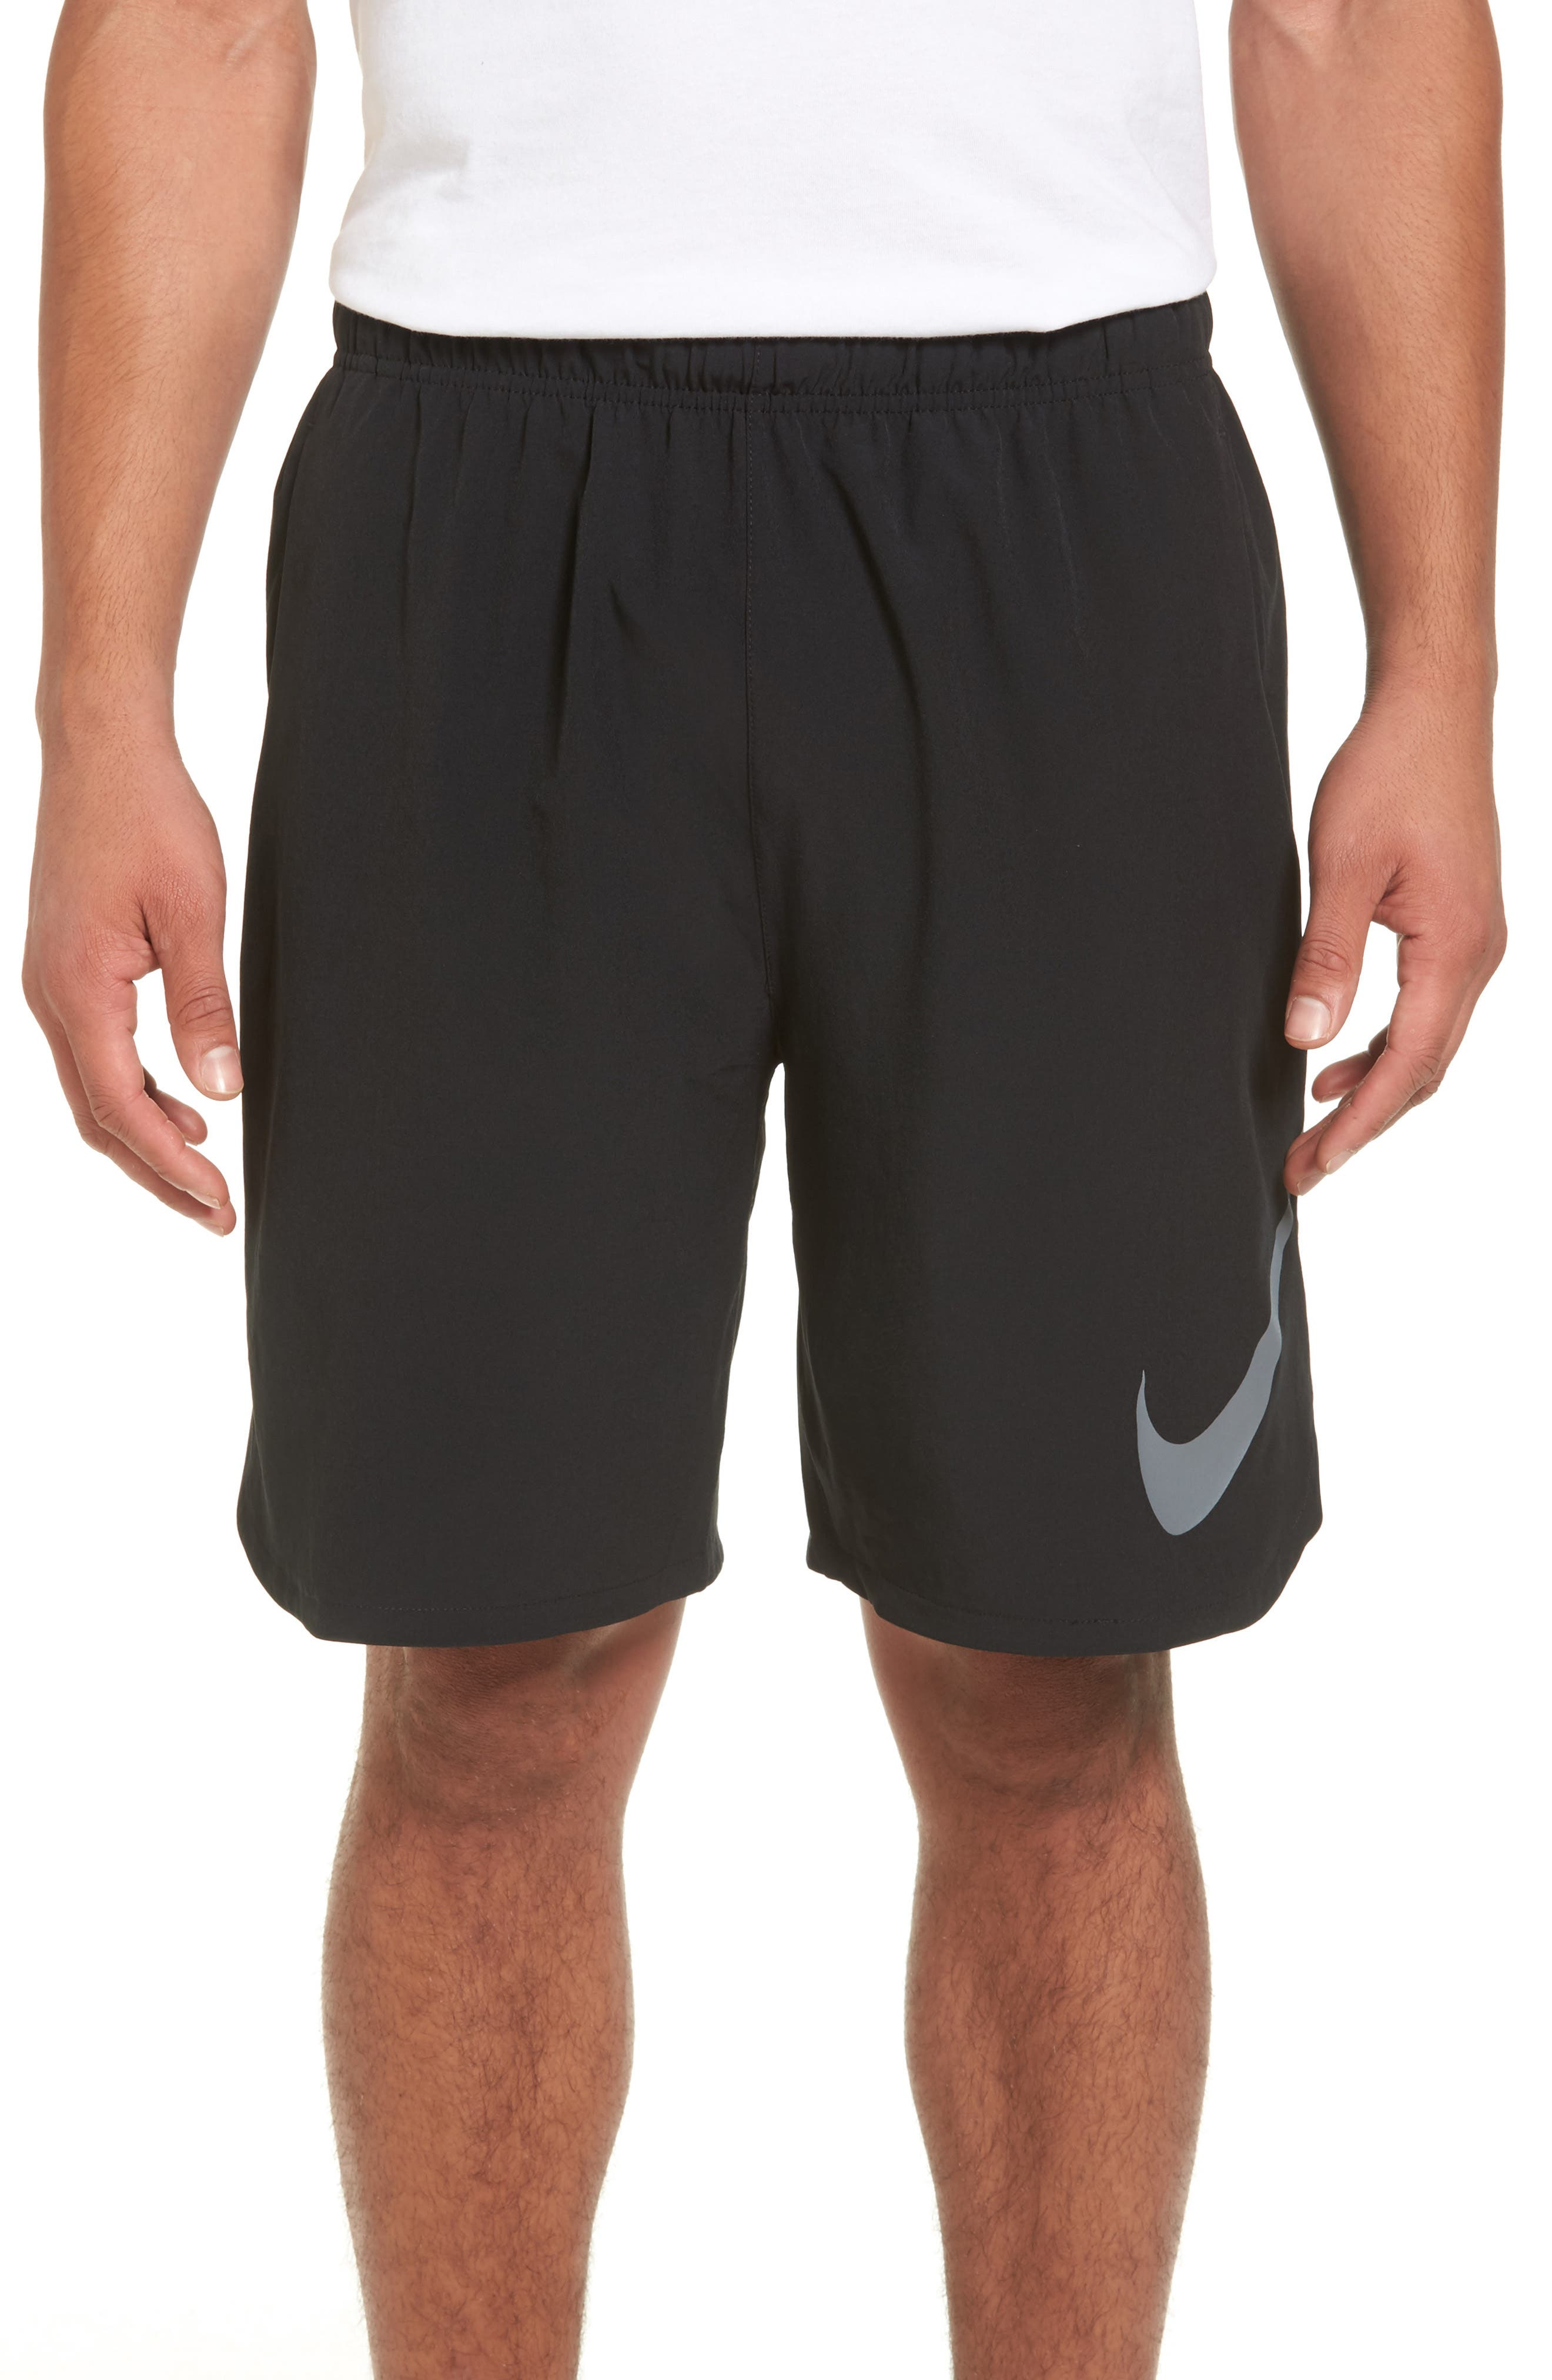 Flex Training Shorts,                             Main thumbnail 1, color,                             010